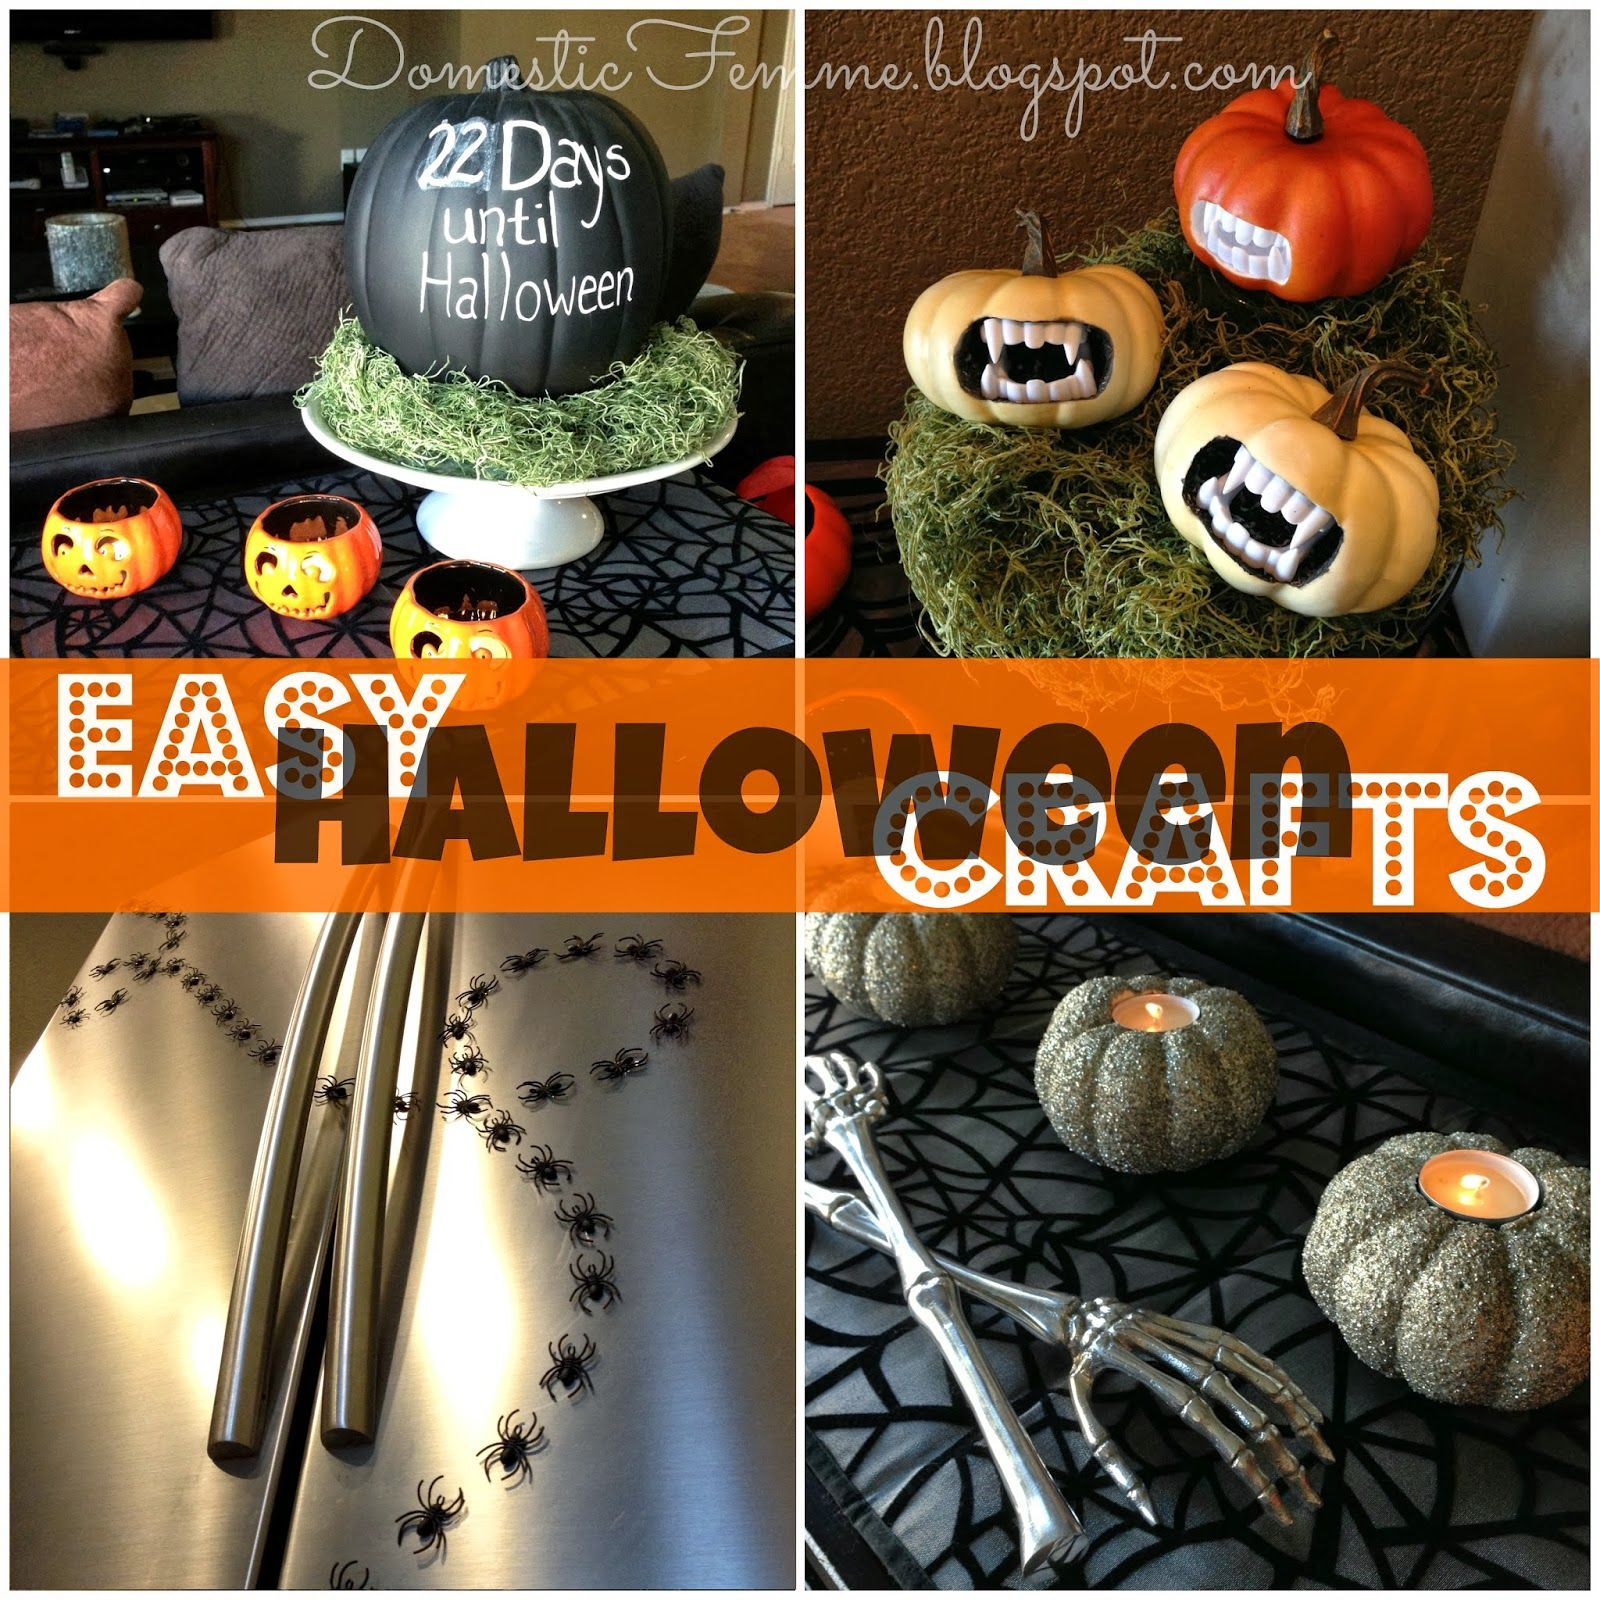 Home Spooky Home: Easy Halloween Crafts | Diy decoration, Dollar ...